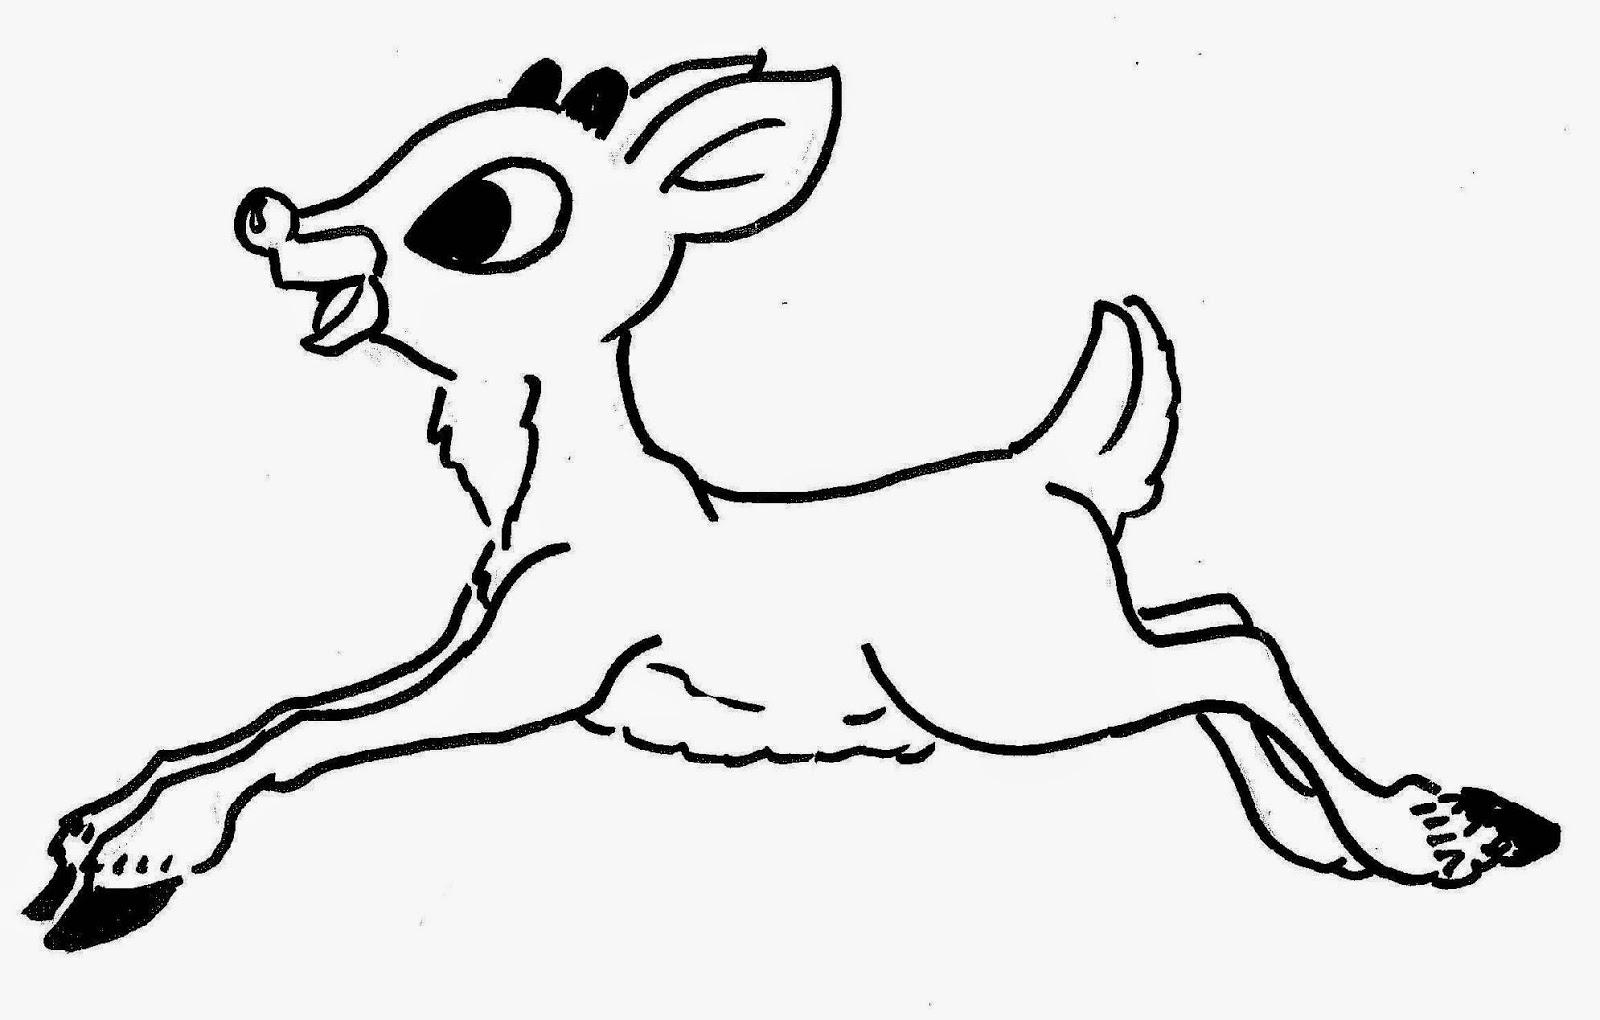 Drawn Reindeer Rodolfo